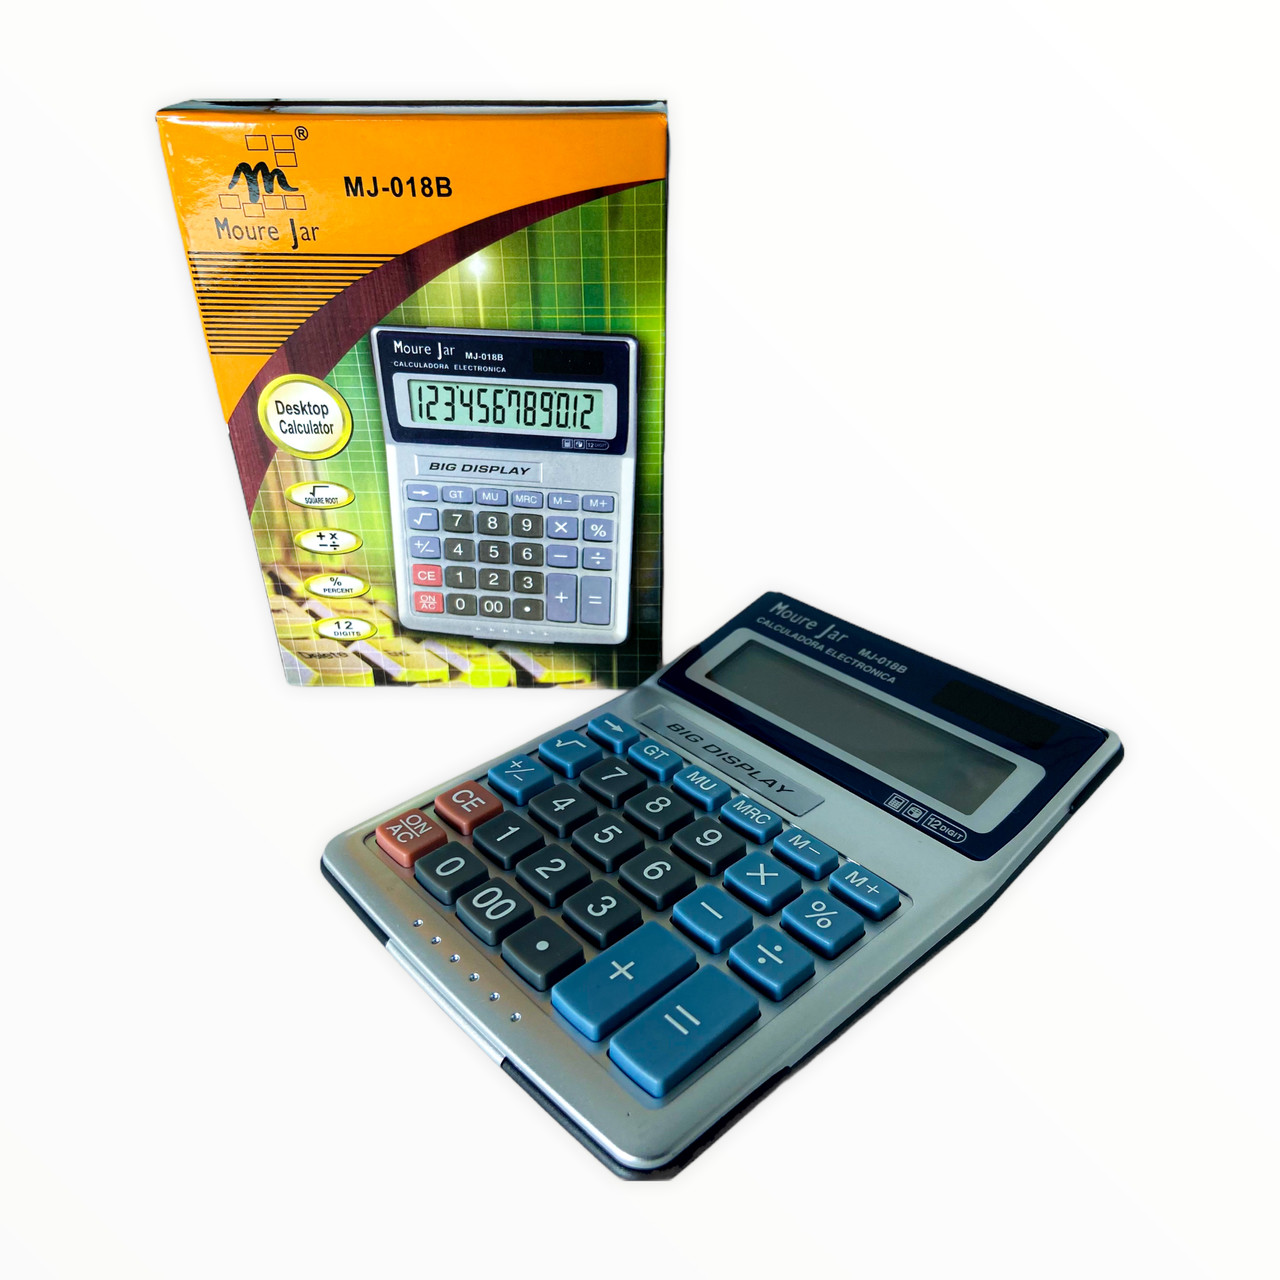 Calculadora de Mesa 12 Dígitos MJ-018B Moure Jar